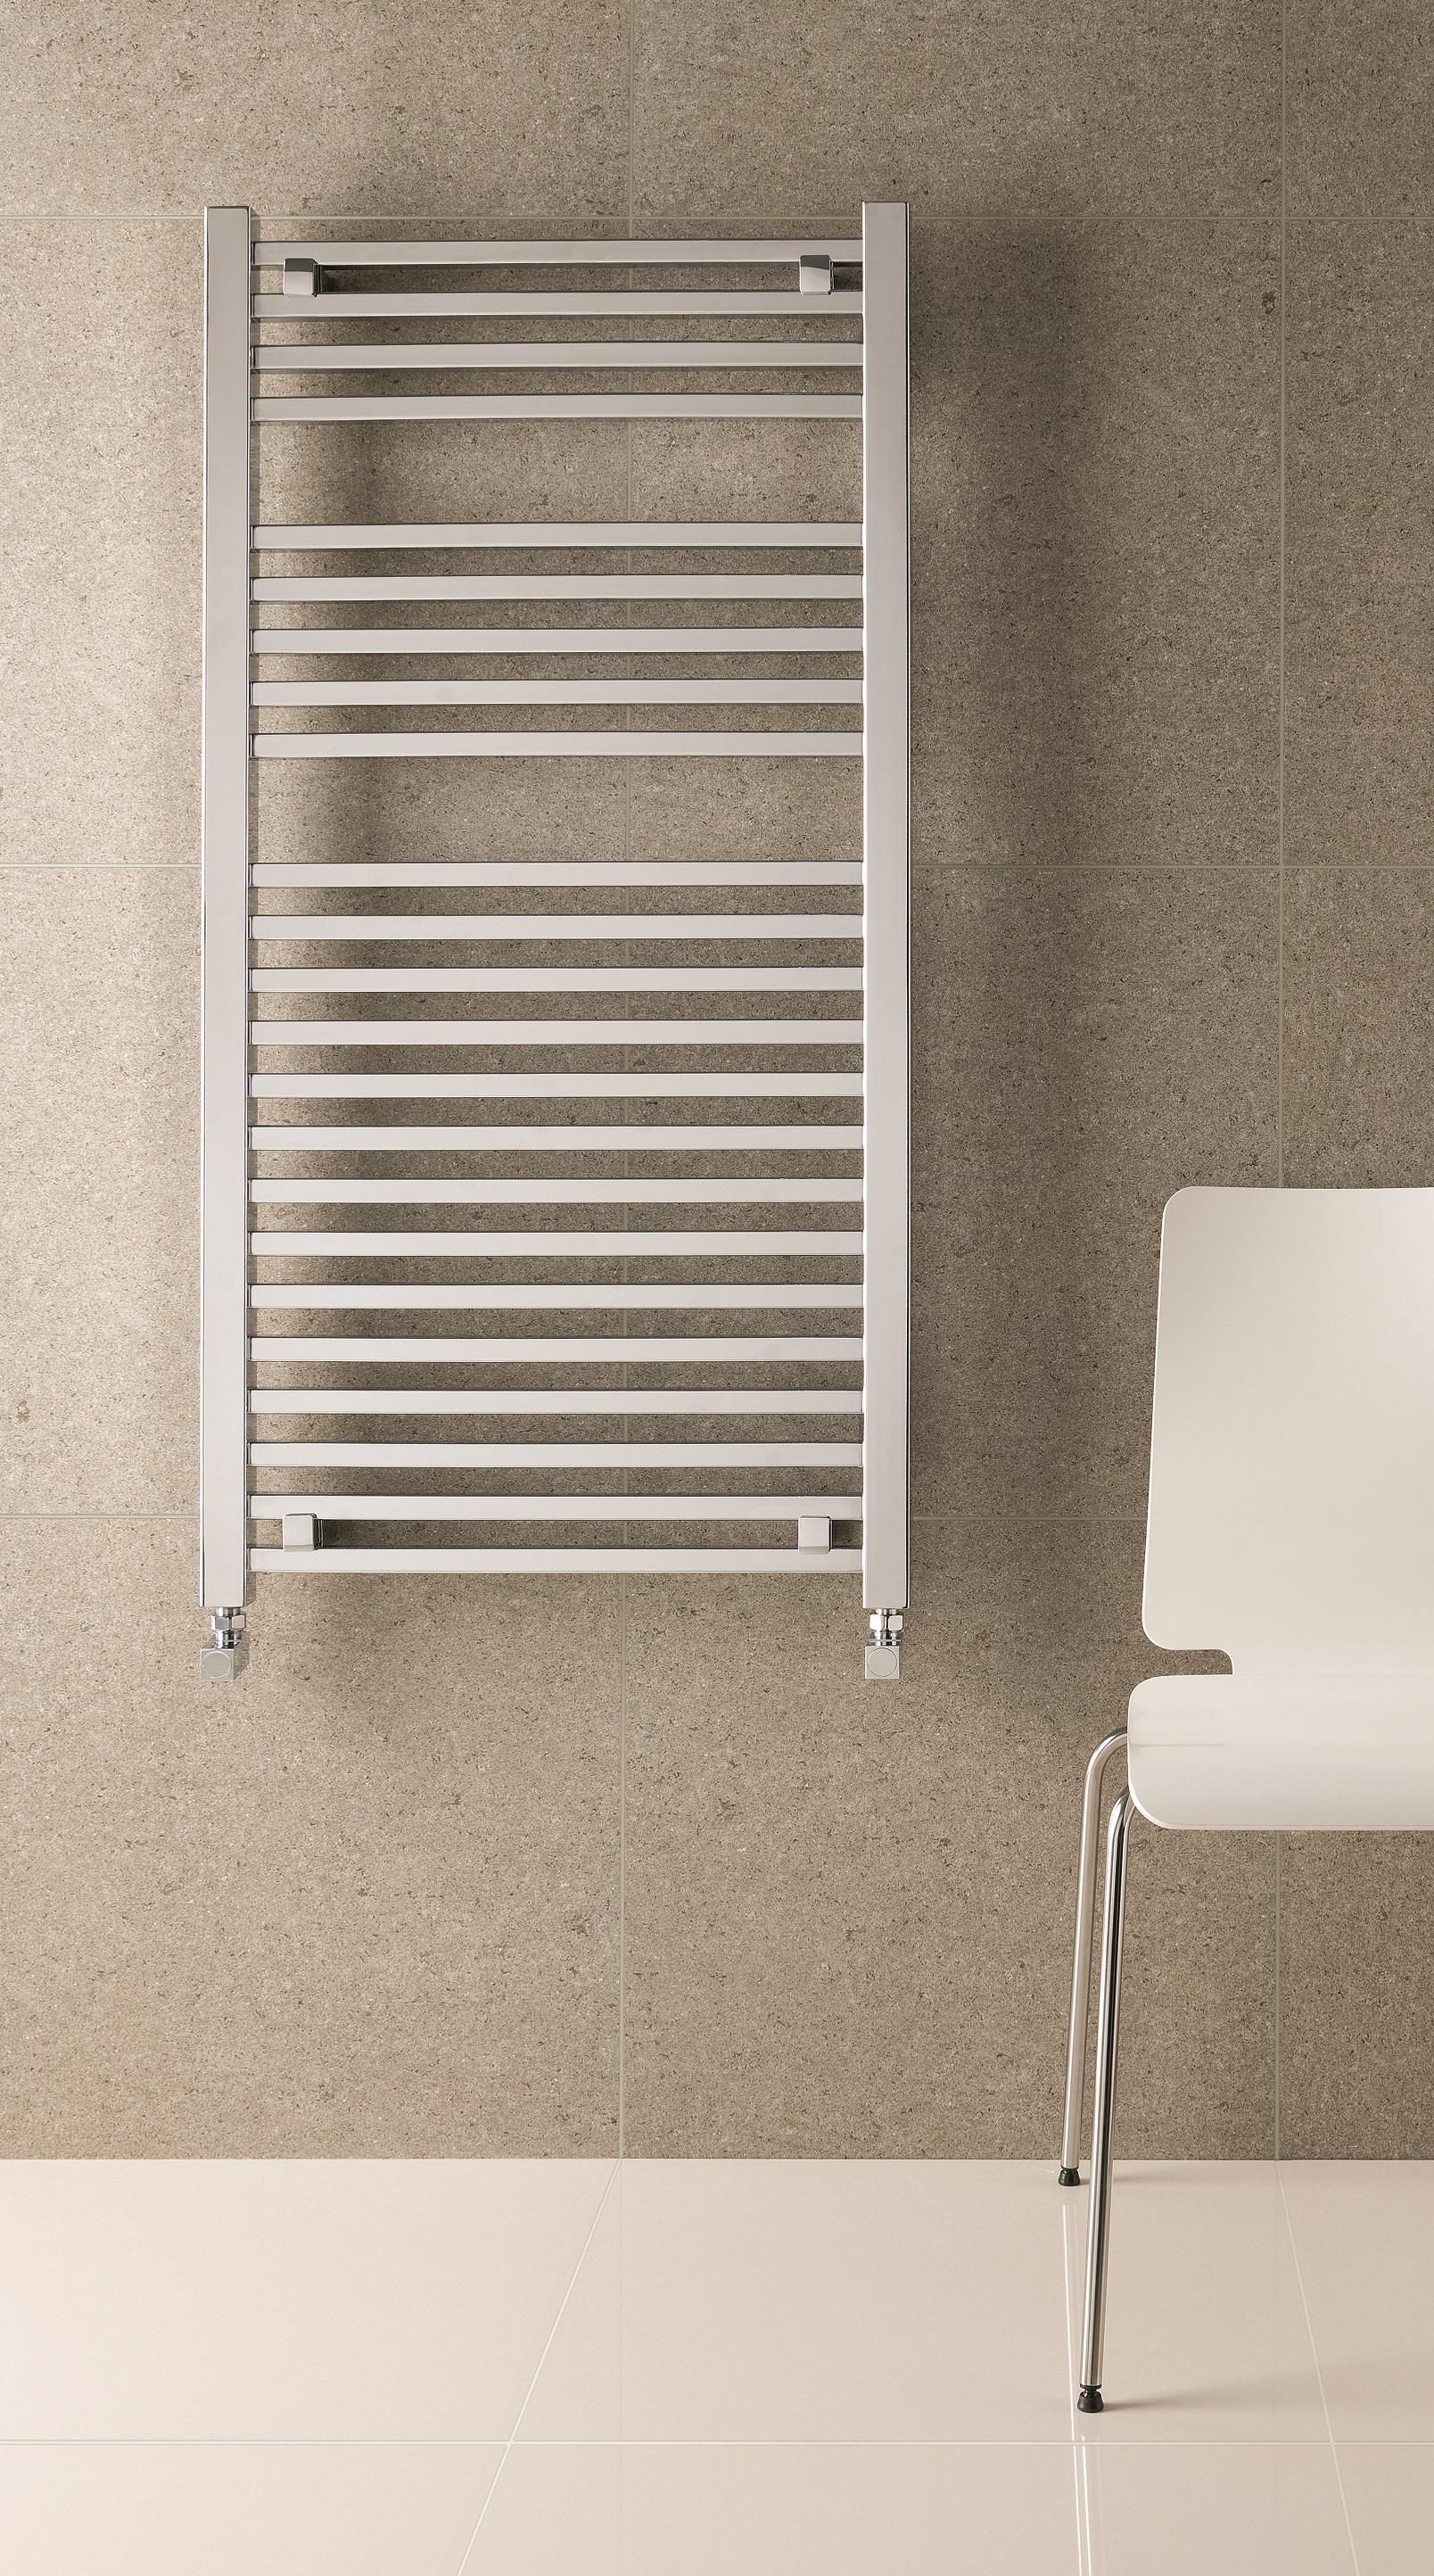 Eastbrook Biava Square handdoek radiator 120x40cm Chroom 511 watt